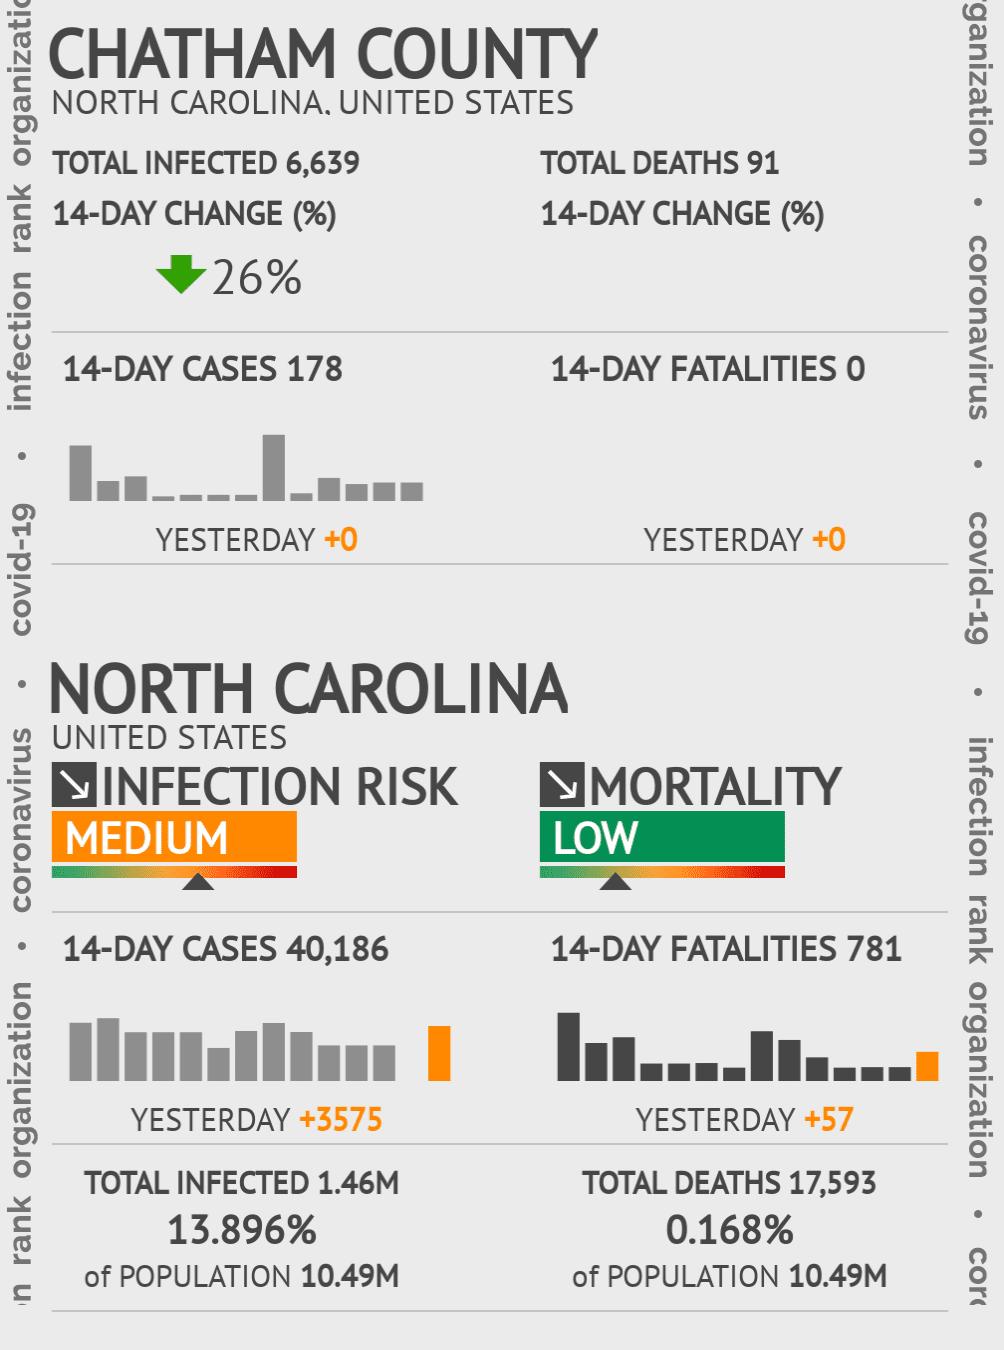 Chatham County Coronavirus Covid-19 Risk of Infection on November 22, 2020